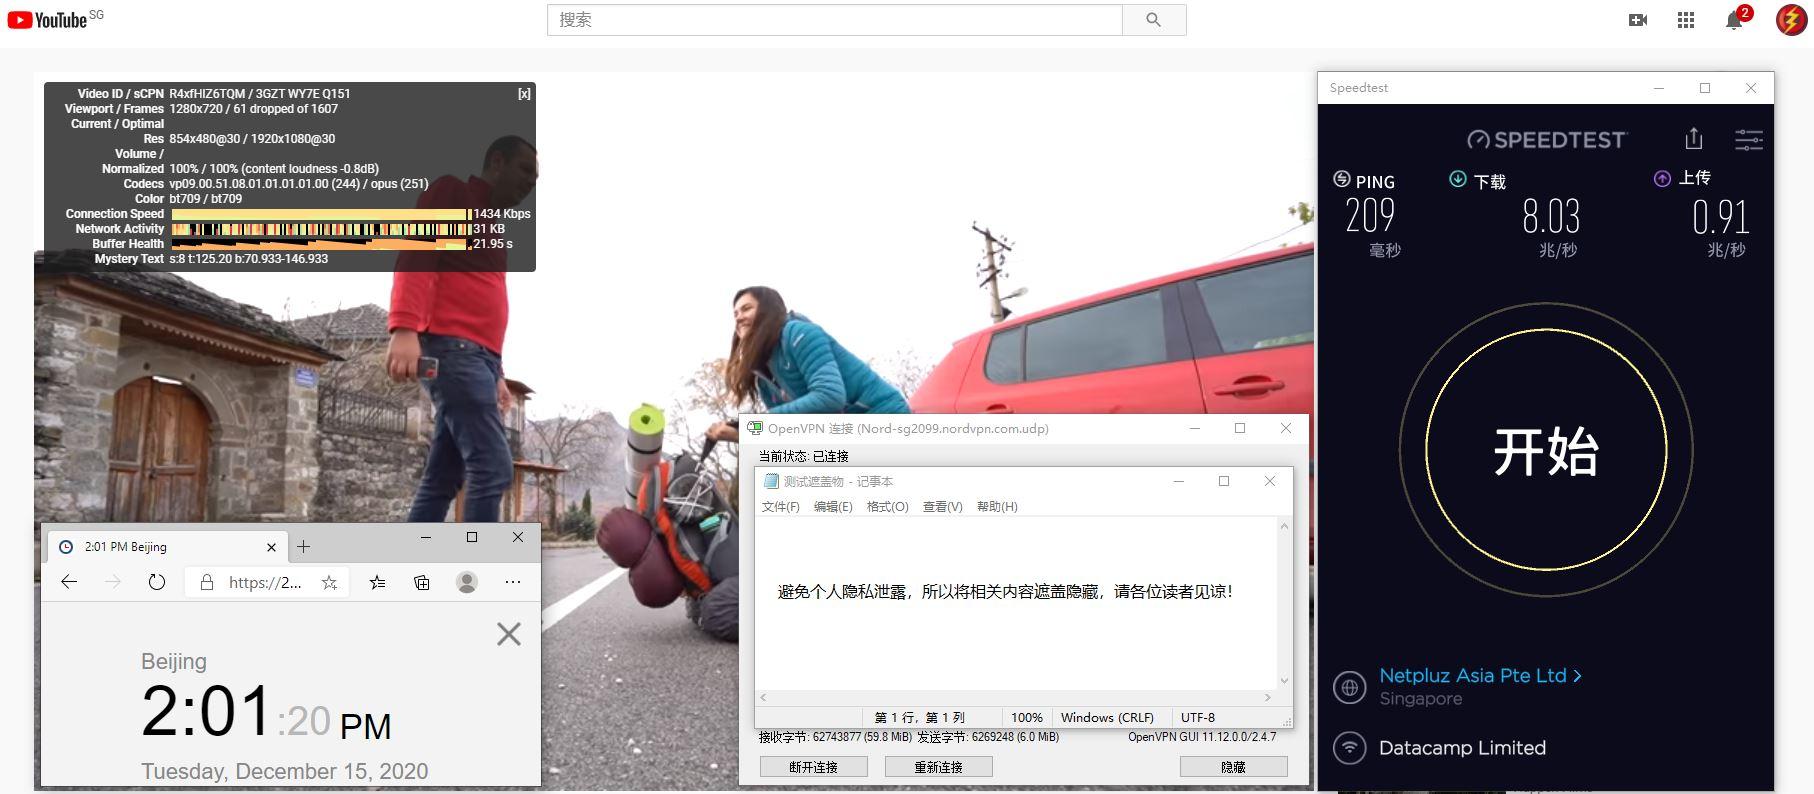 Windows10 NordVPN OpenVPN Gui SG2099 服务器 中国VPN 翻墙 科学上网 测试 - 20201215